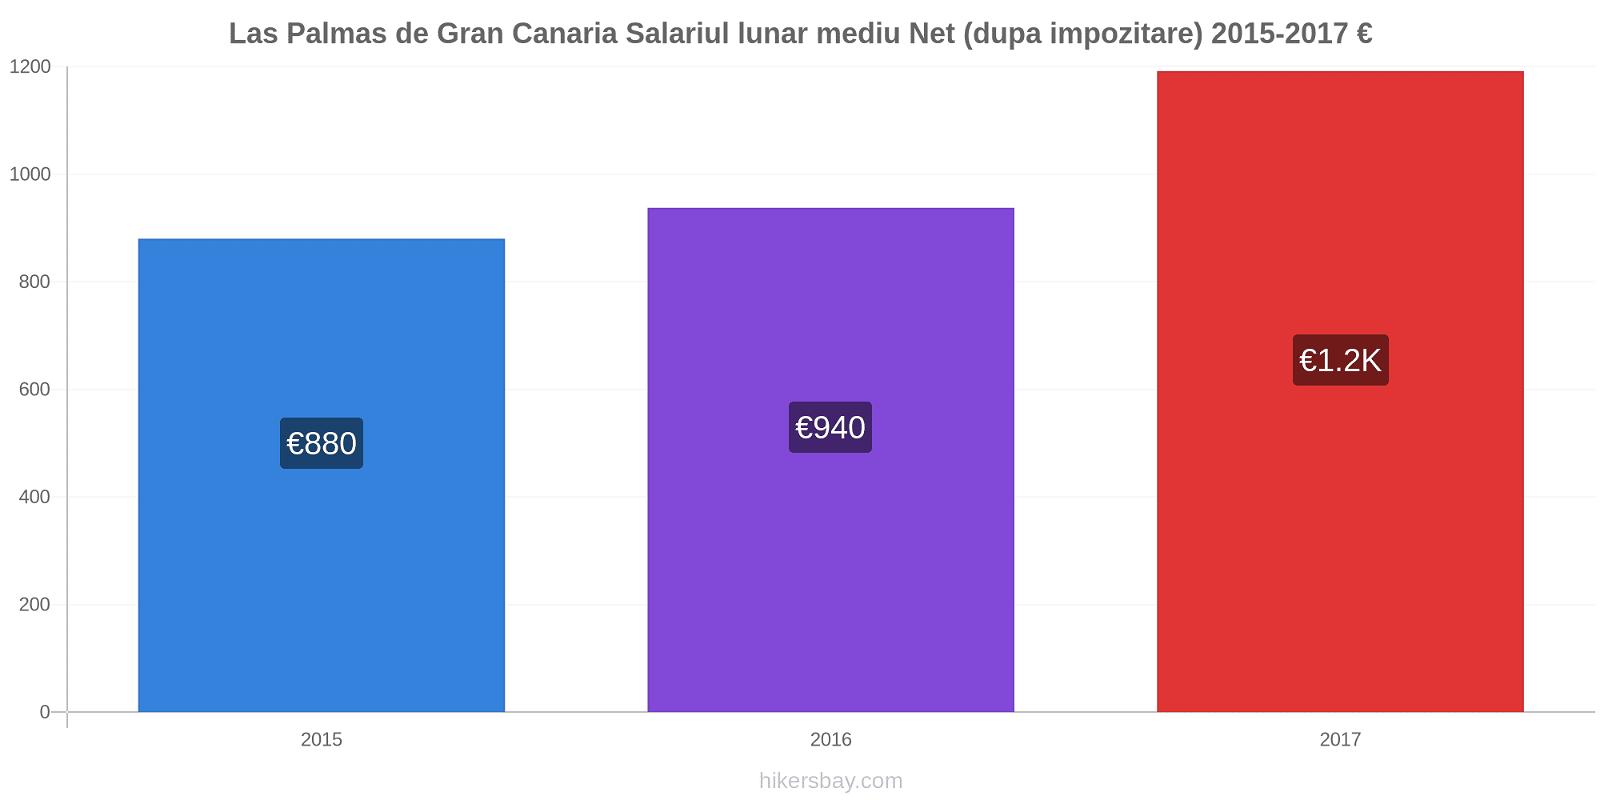 Las Palmas de Gran Canaria modificări de preț Salariul lunar mediu Net (dupa impozitare) hikersbay.com